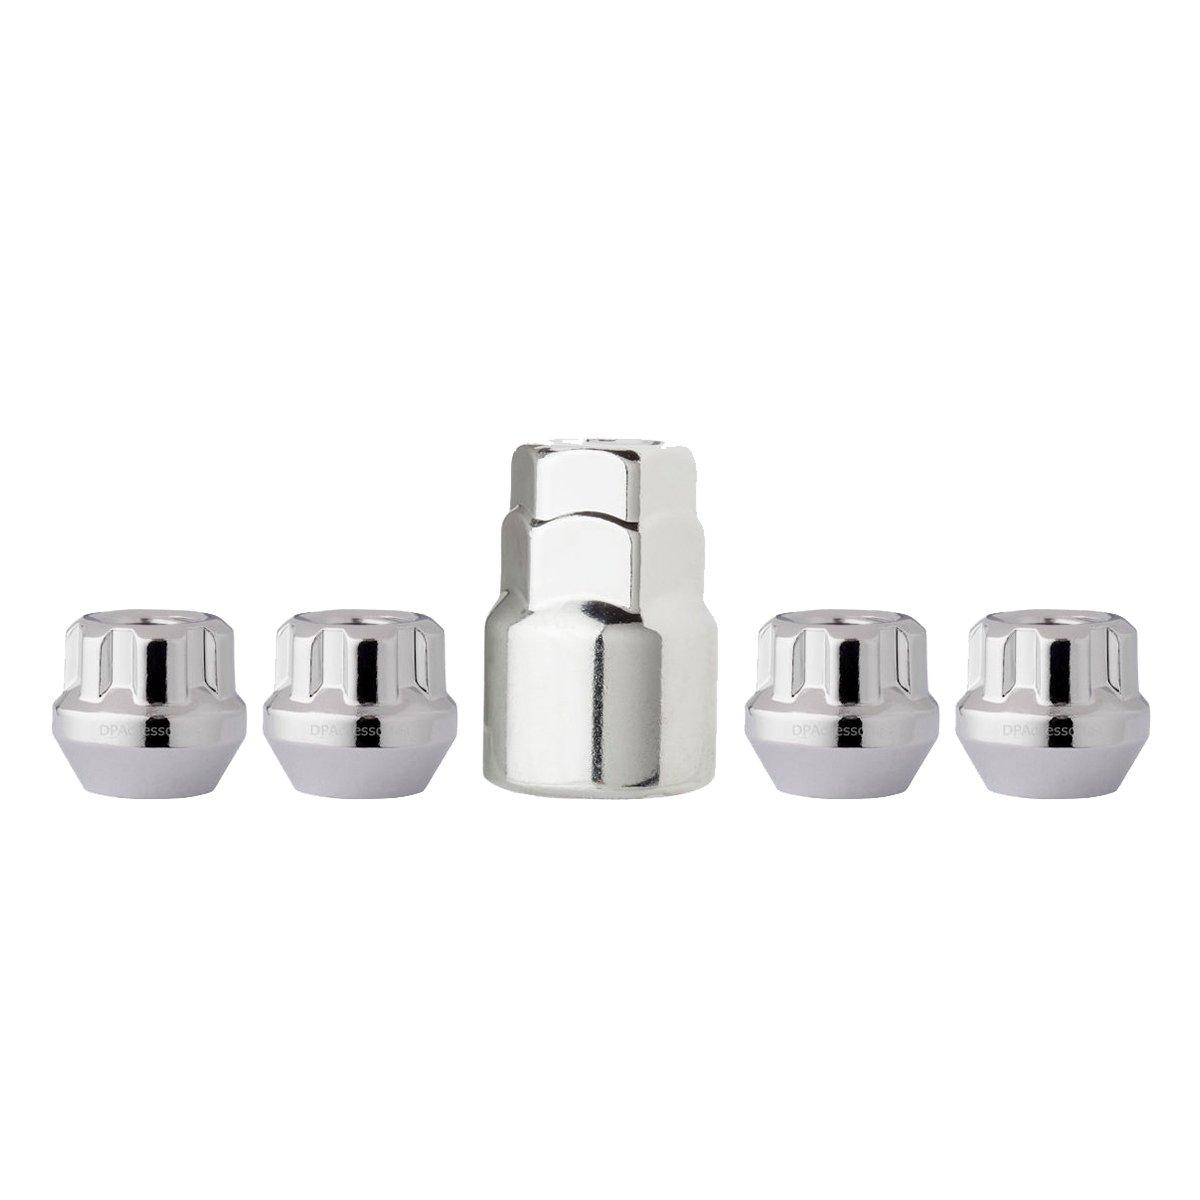 Gorilla Automotive Chrome Acorn Guard Wheel Locks Lug Nuts 14x1.5 14mm 4 Set NEW